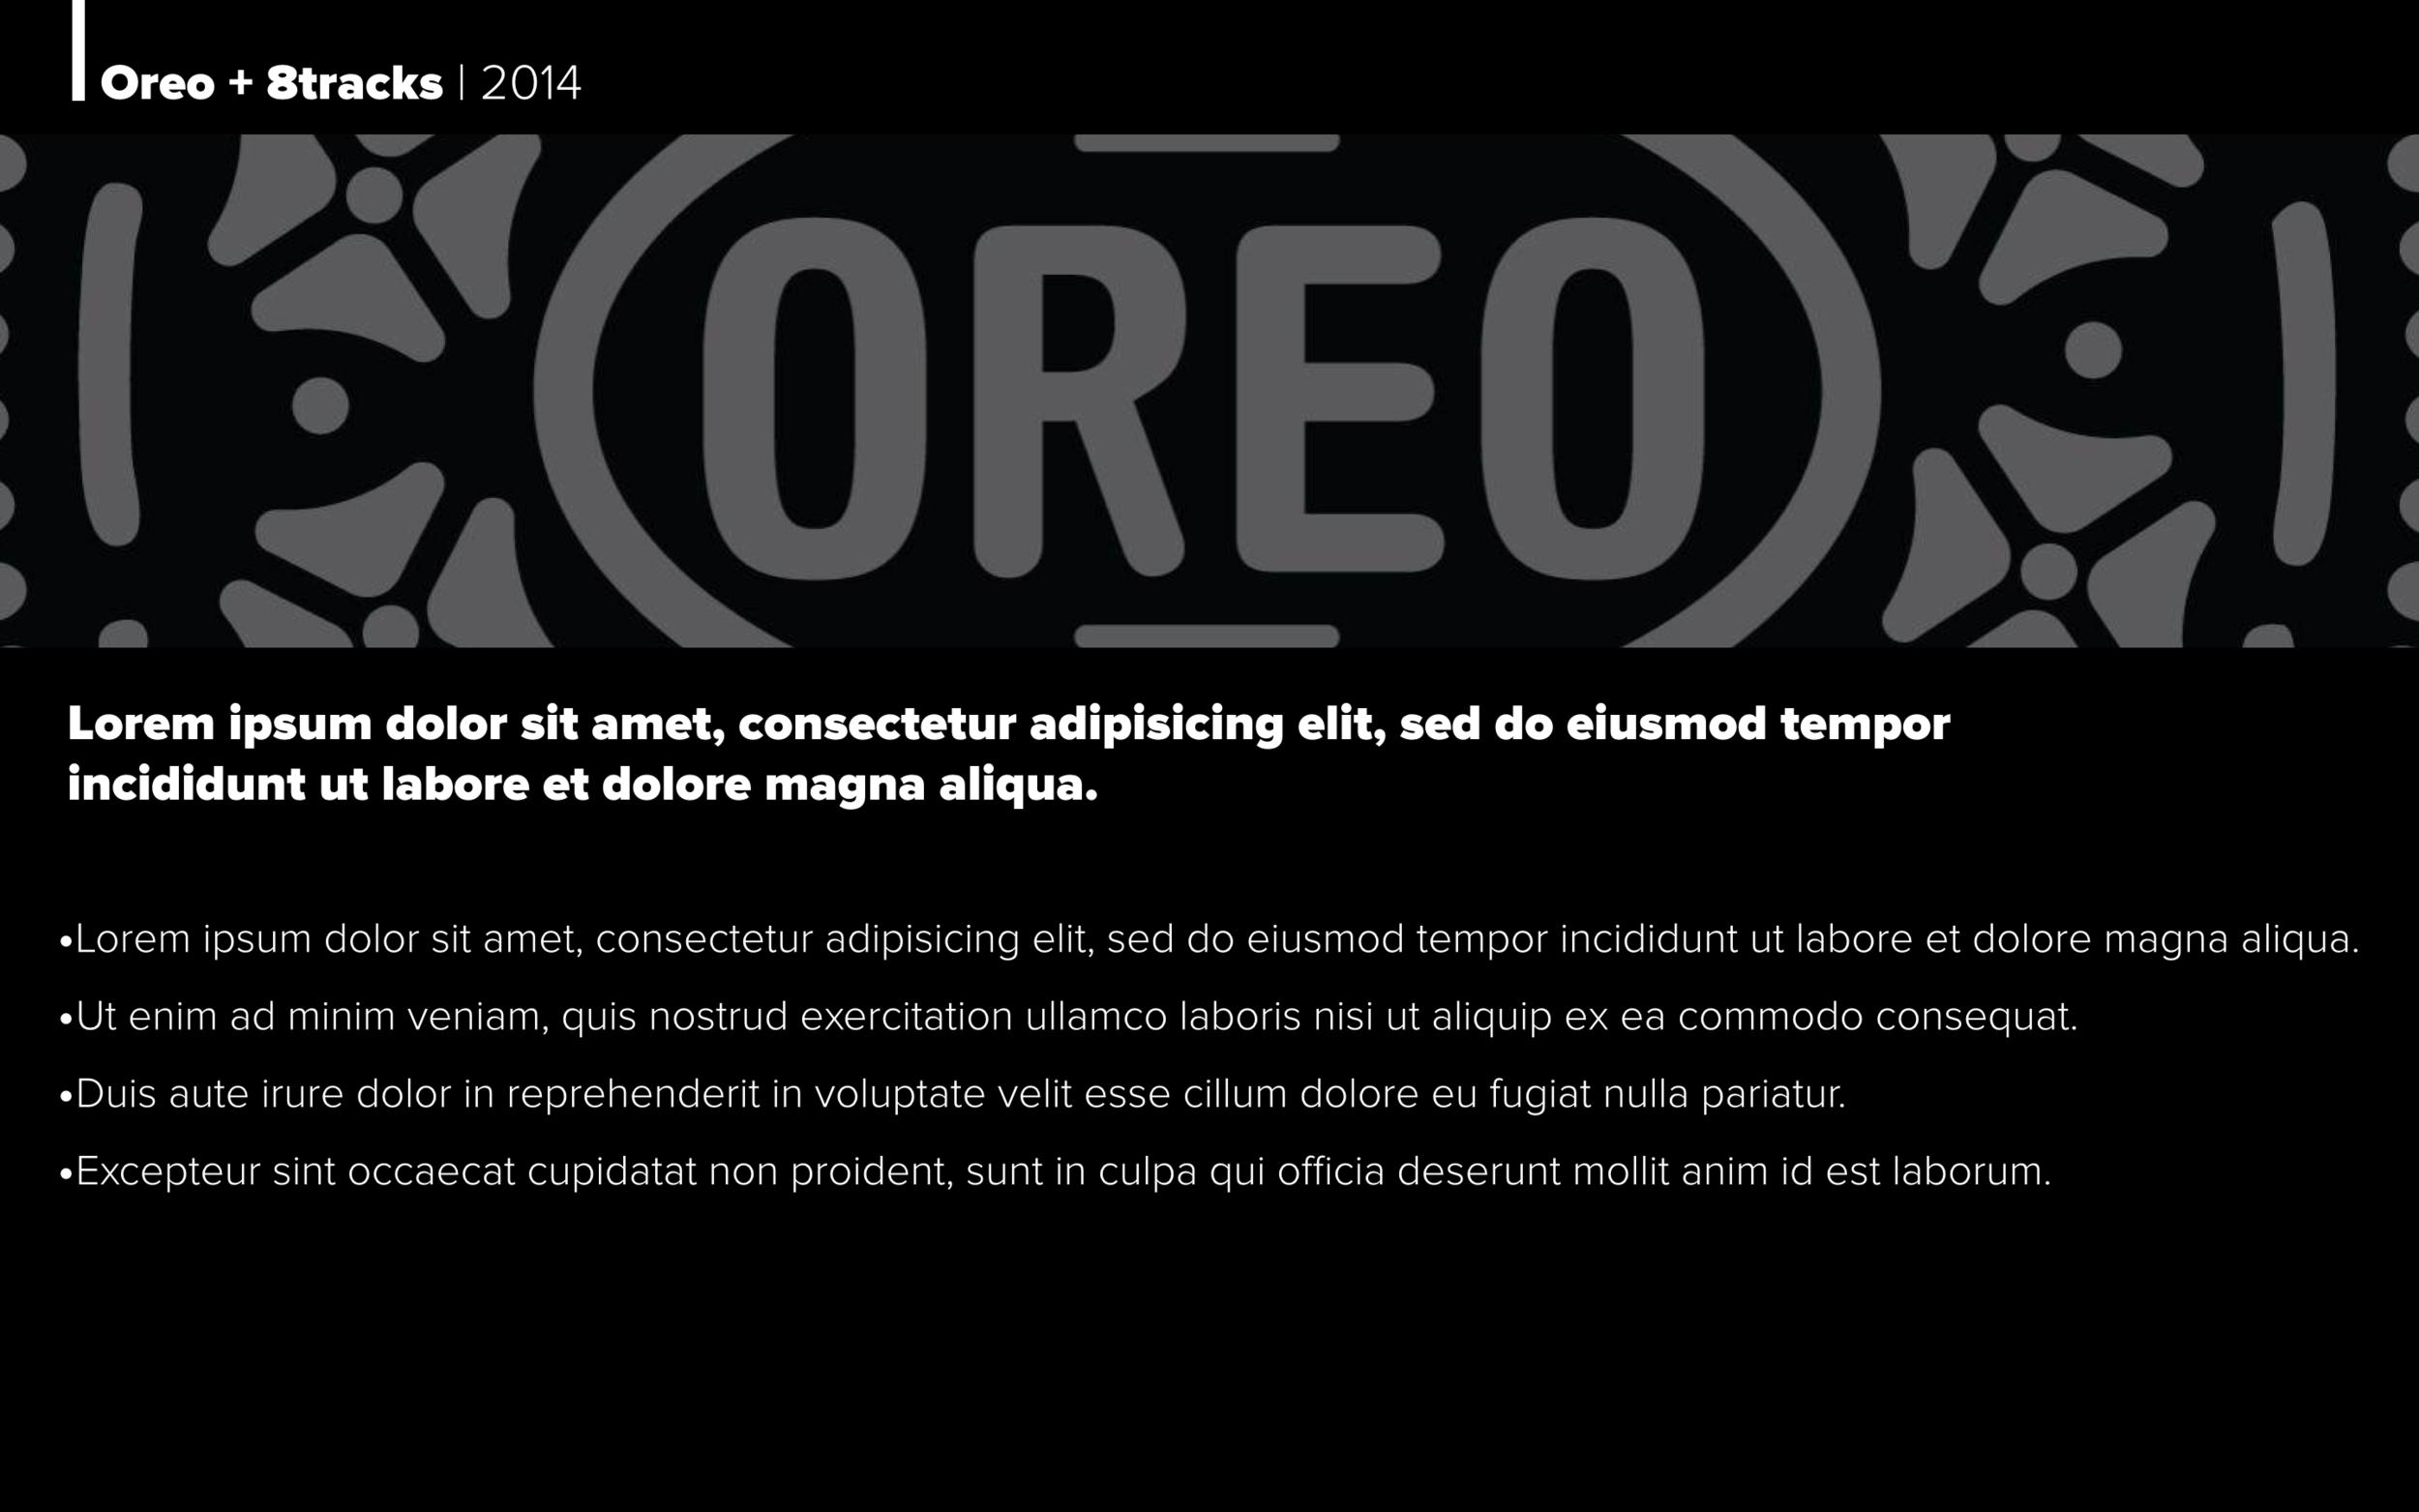 Screenshot 2014-11-19 23.22.54.png